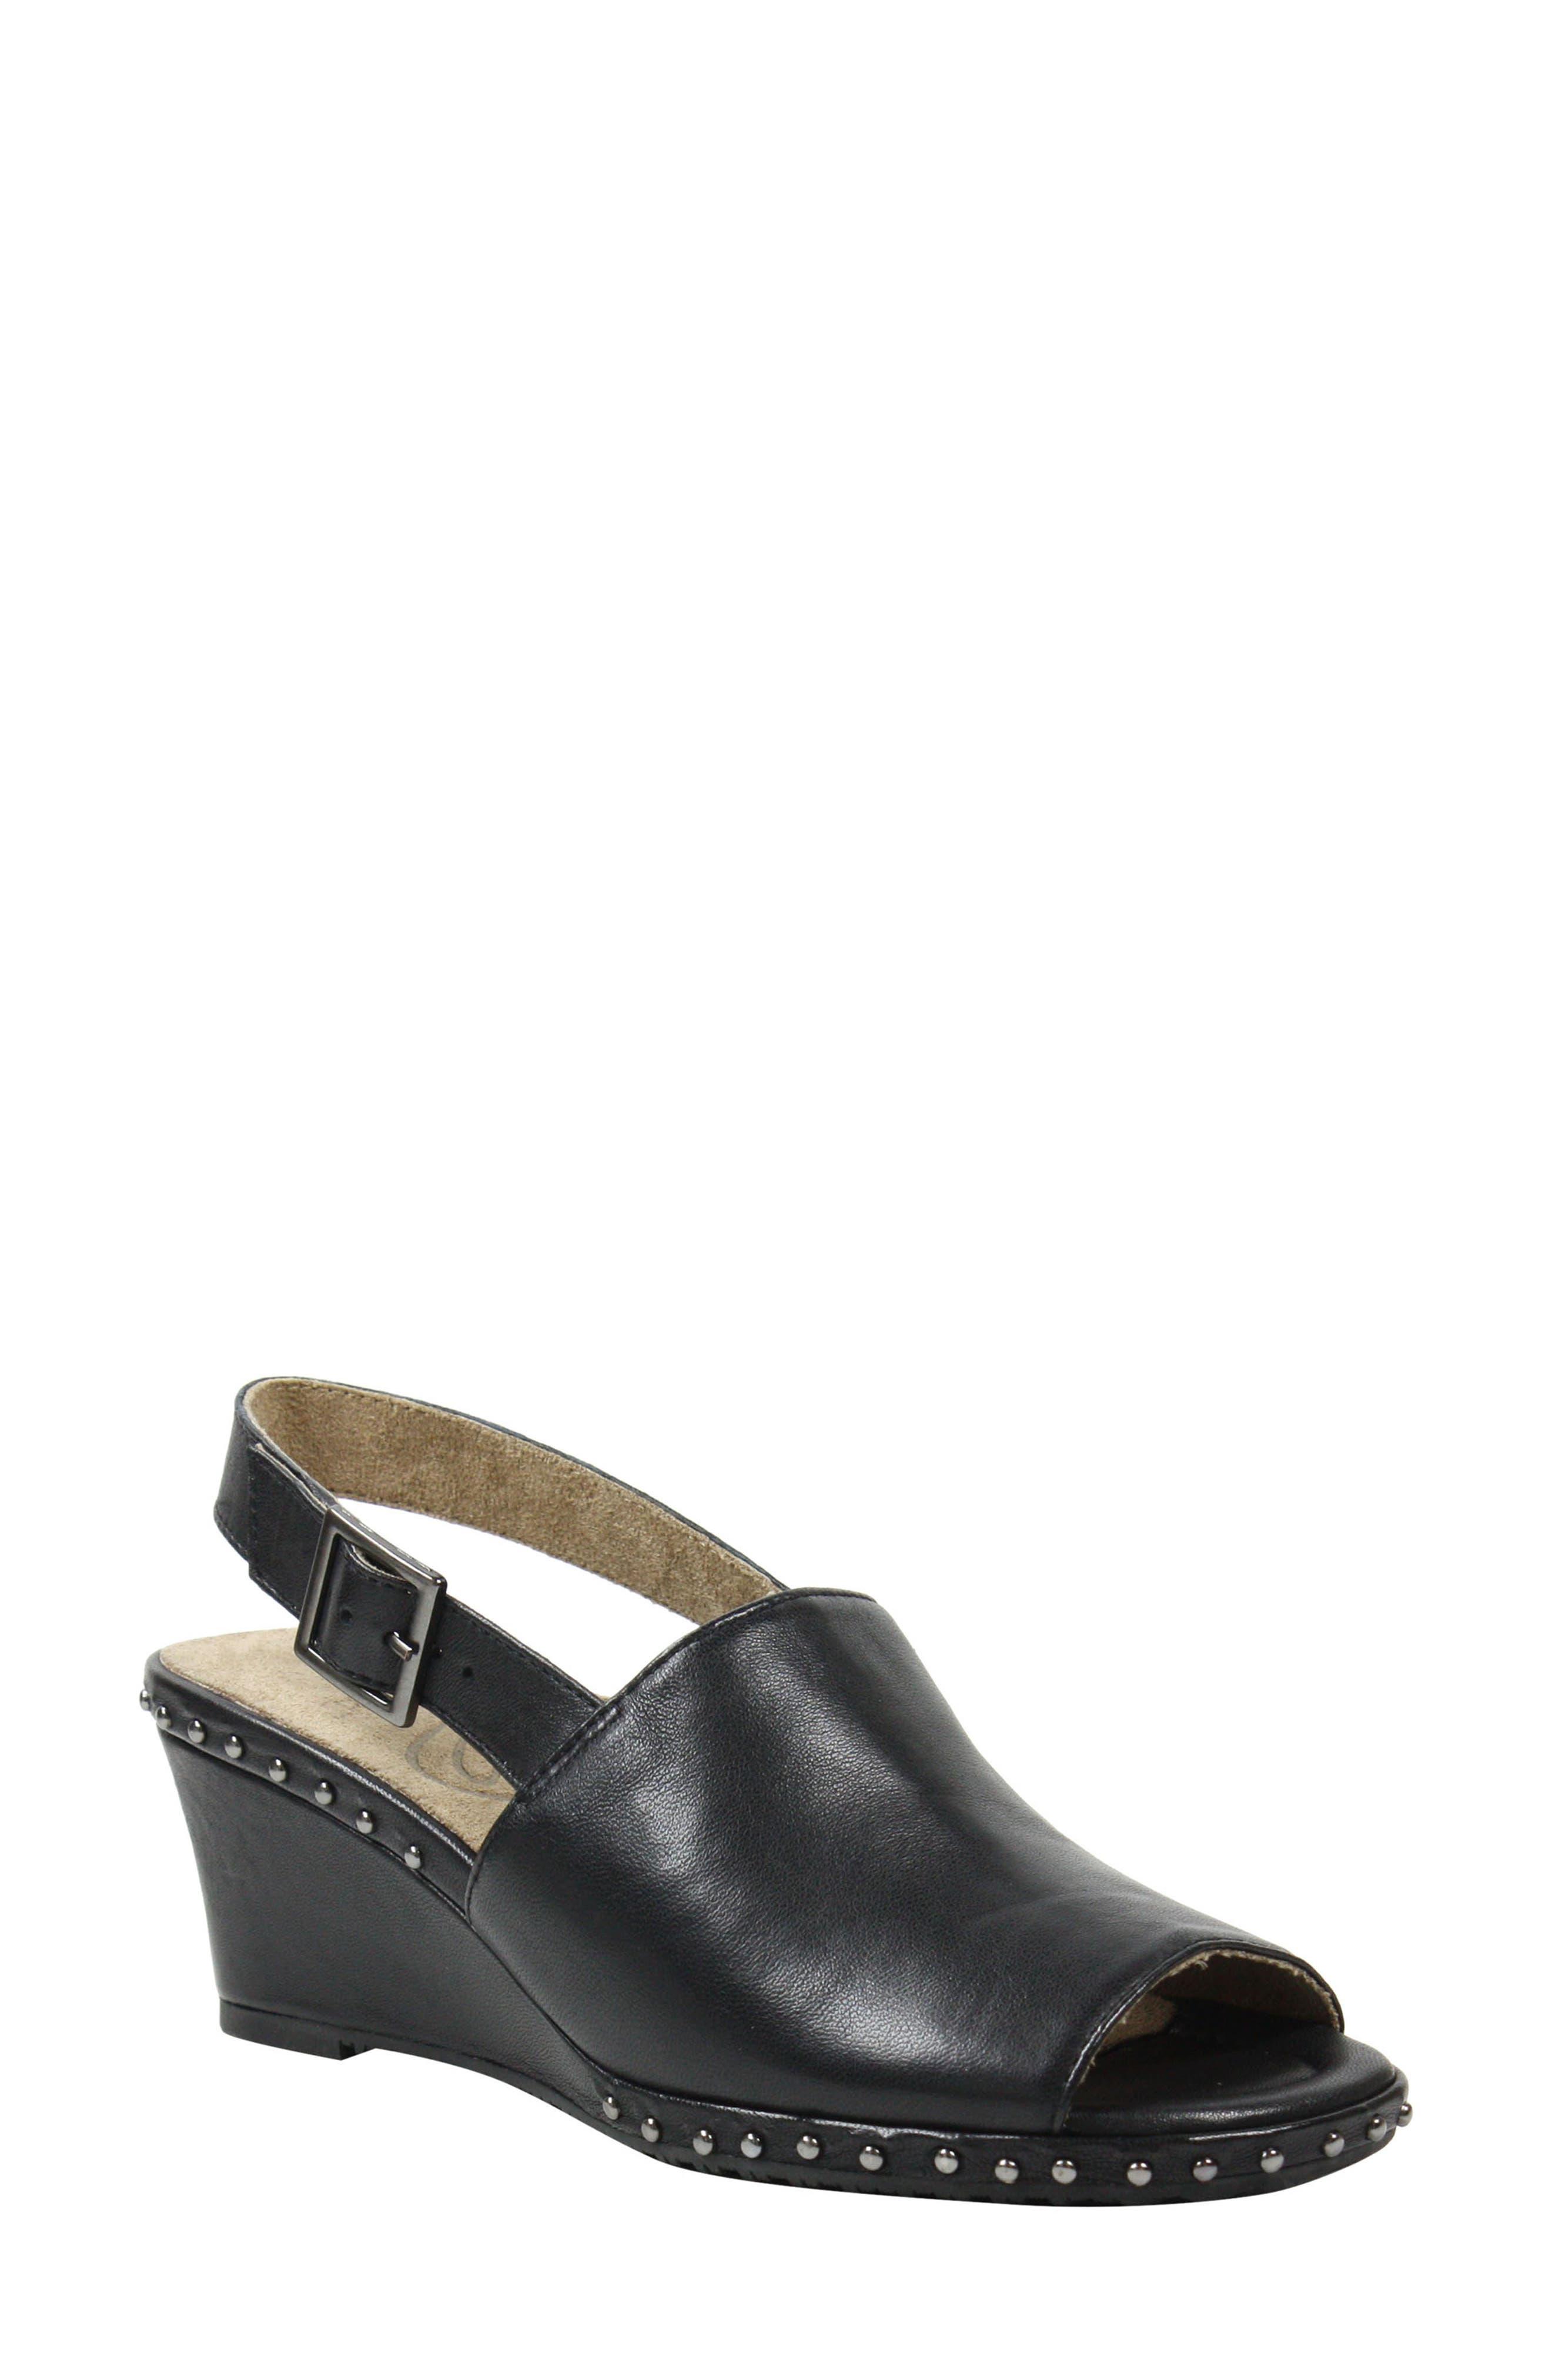 Antandra Wedge Sandal,                             Main thumbnail 1, color,                             BLACK LEATHER